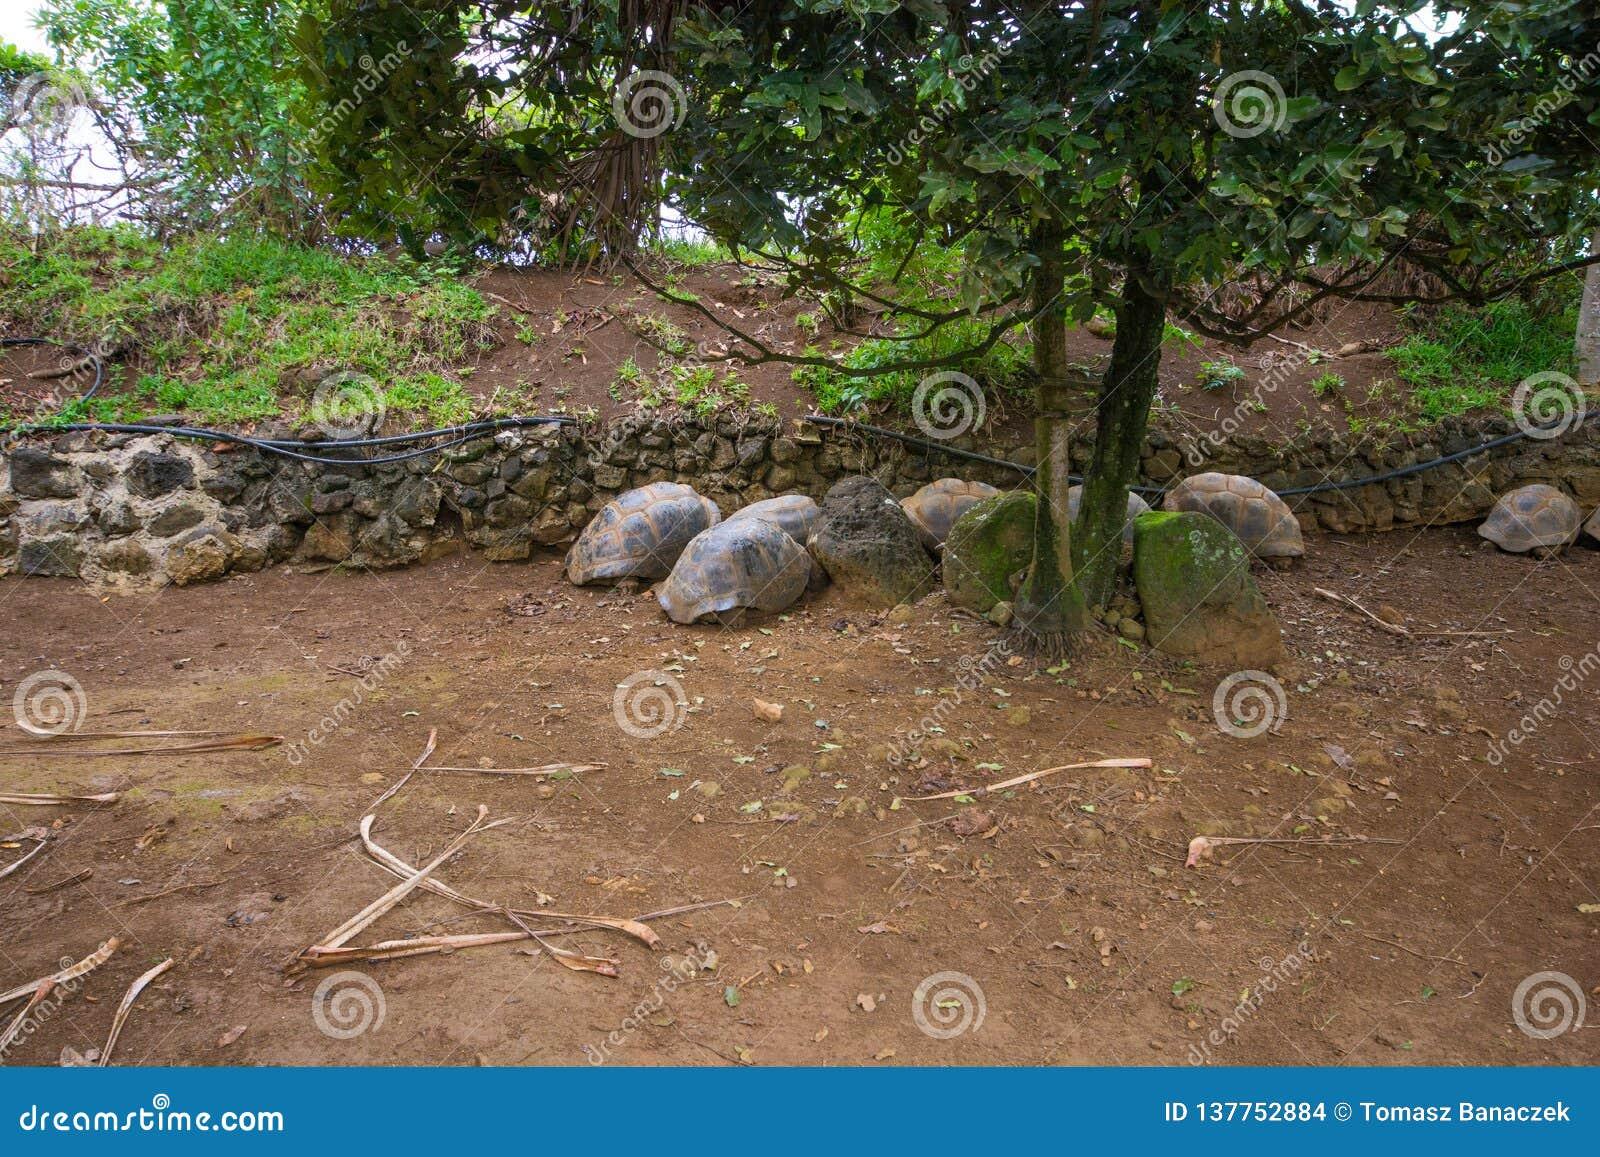 Sleeping turtles in La Vanille natural park, Mauritius